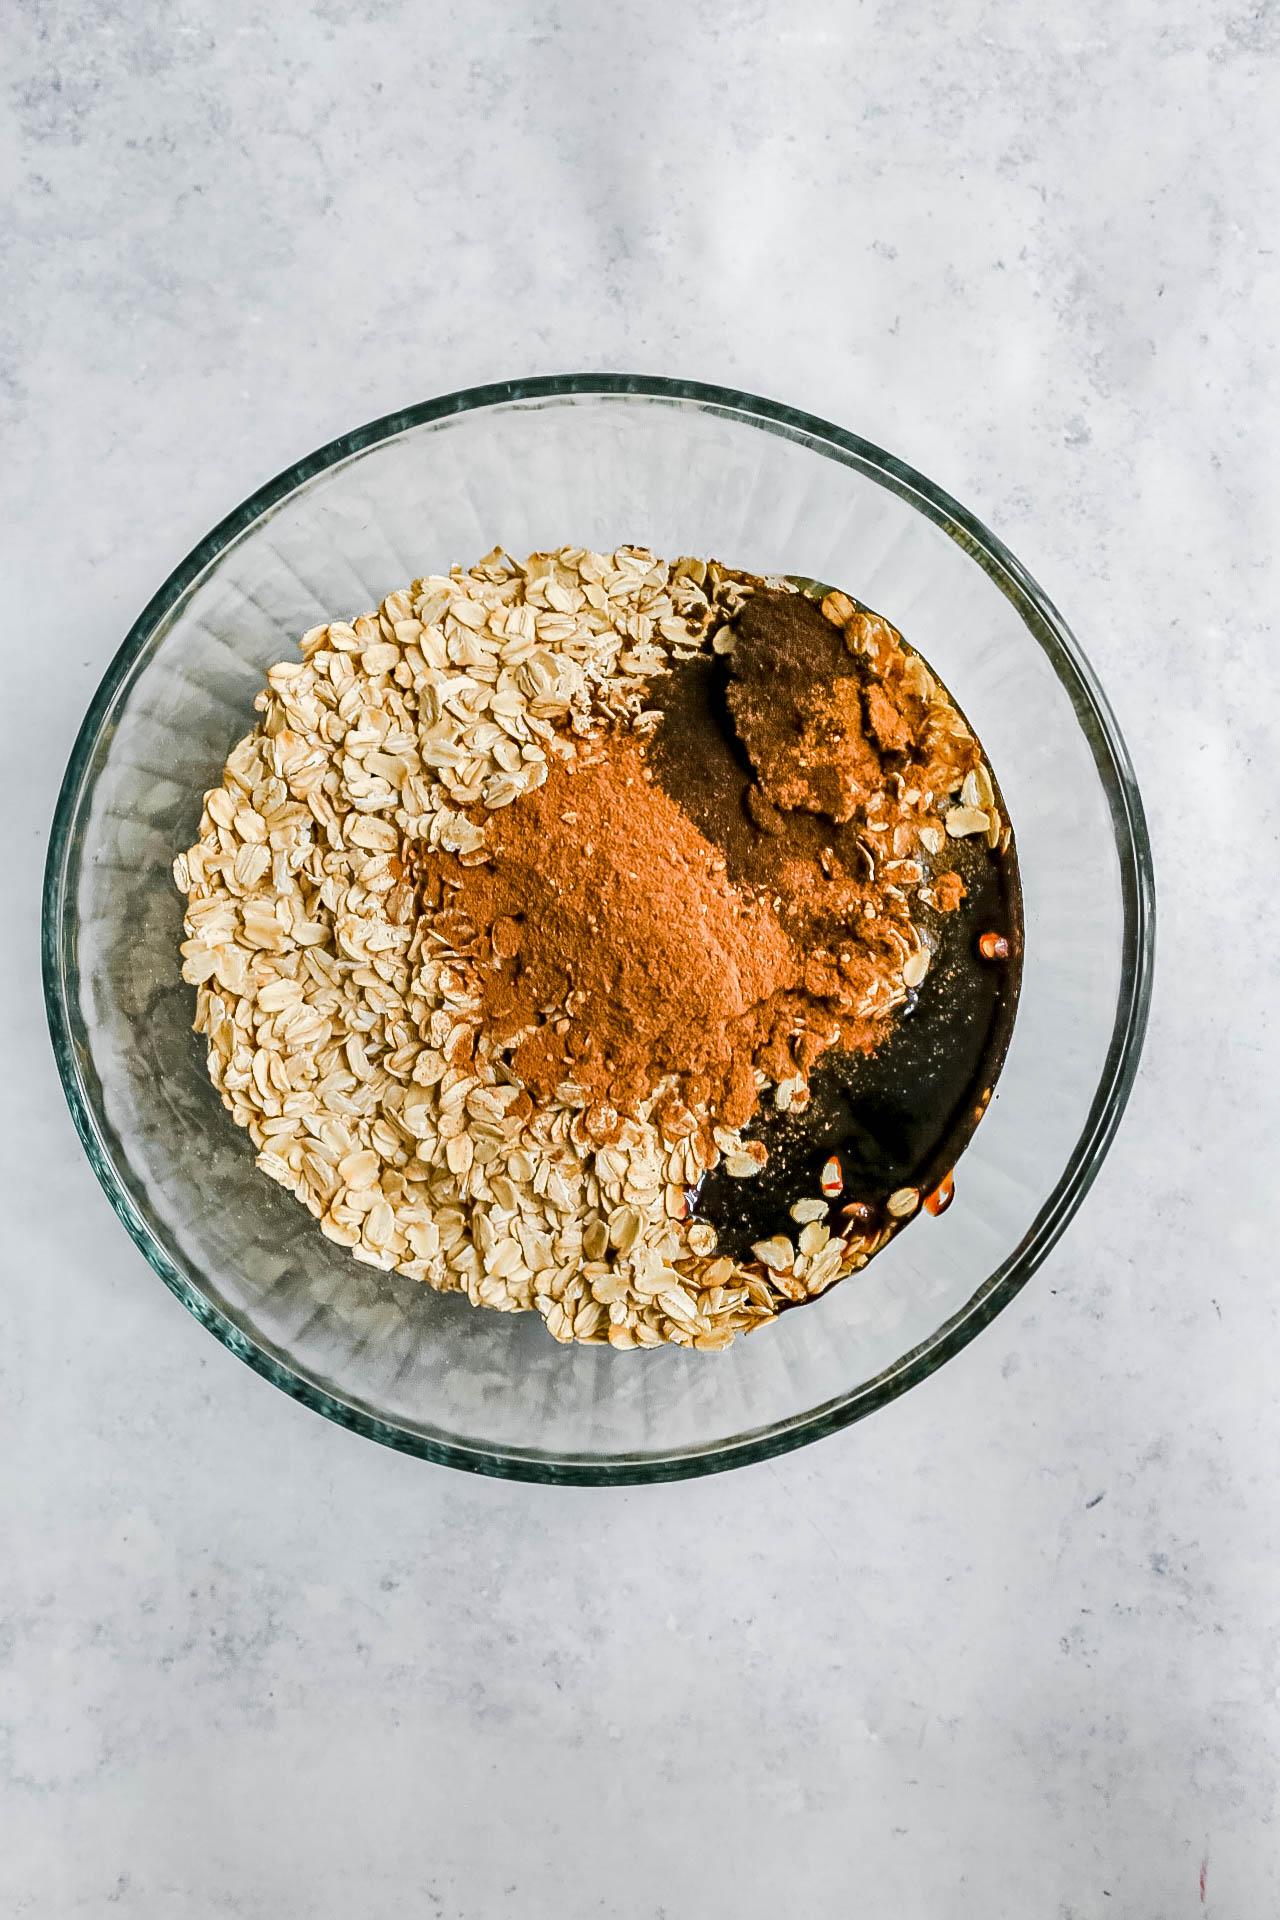 Pumpkin Spice Latte Granola Ingredients in a bowl